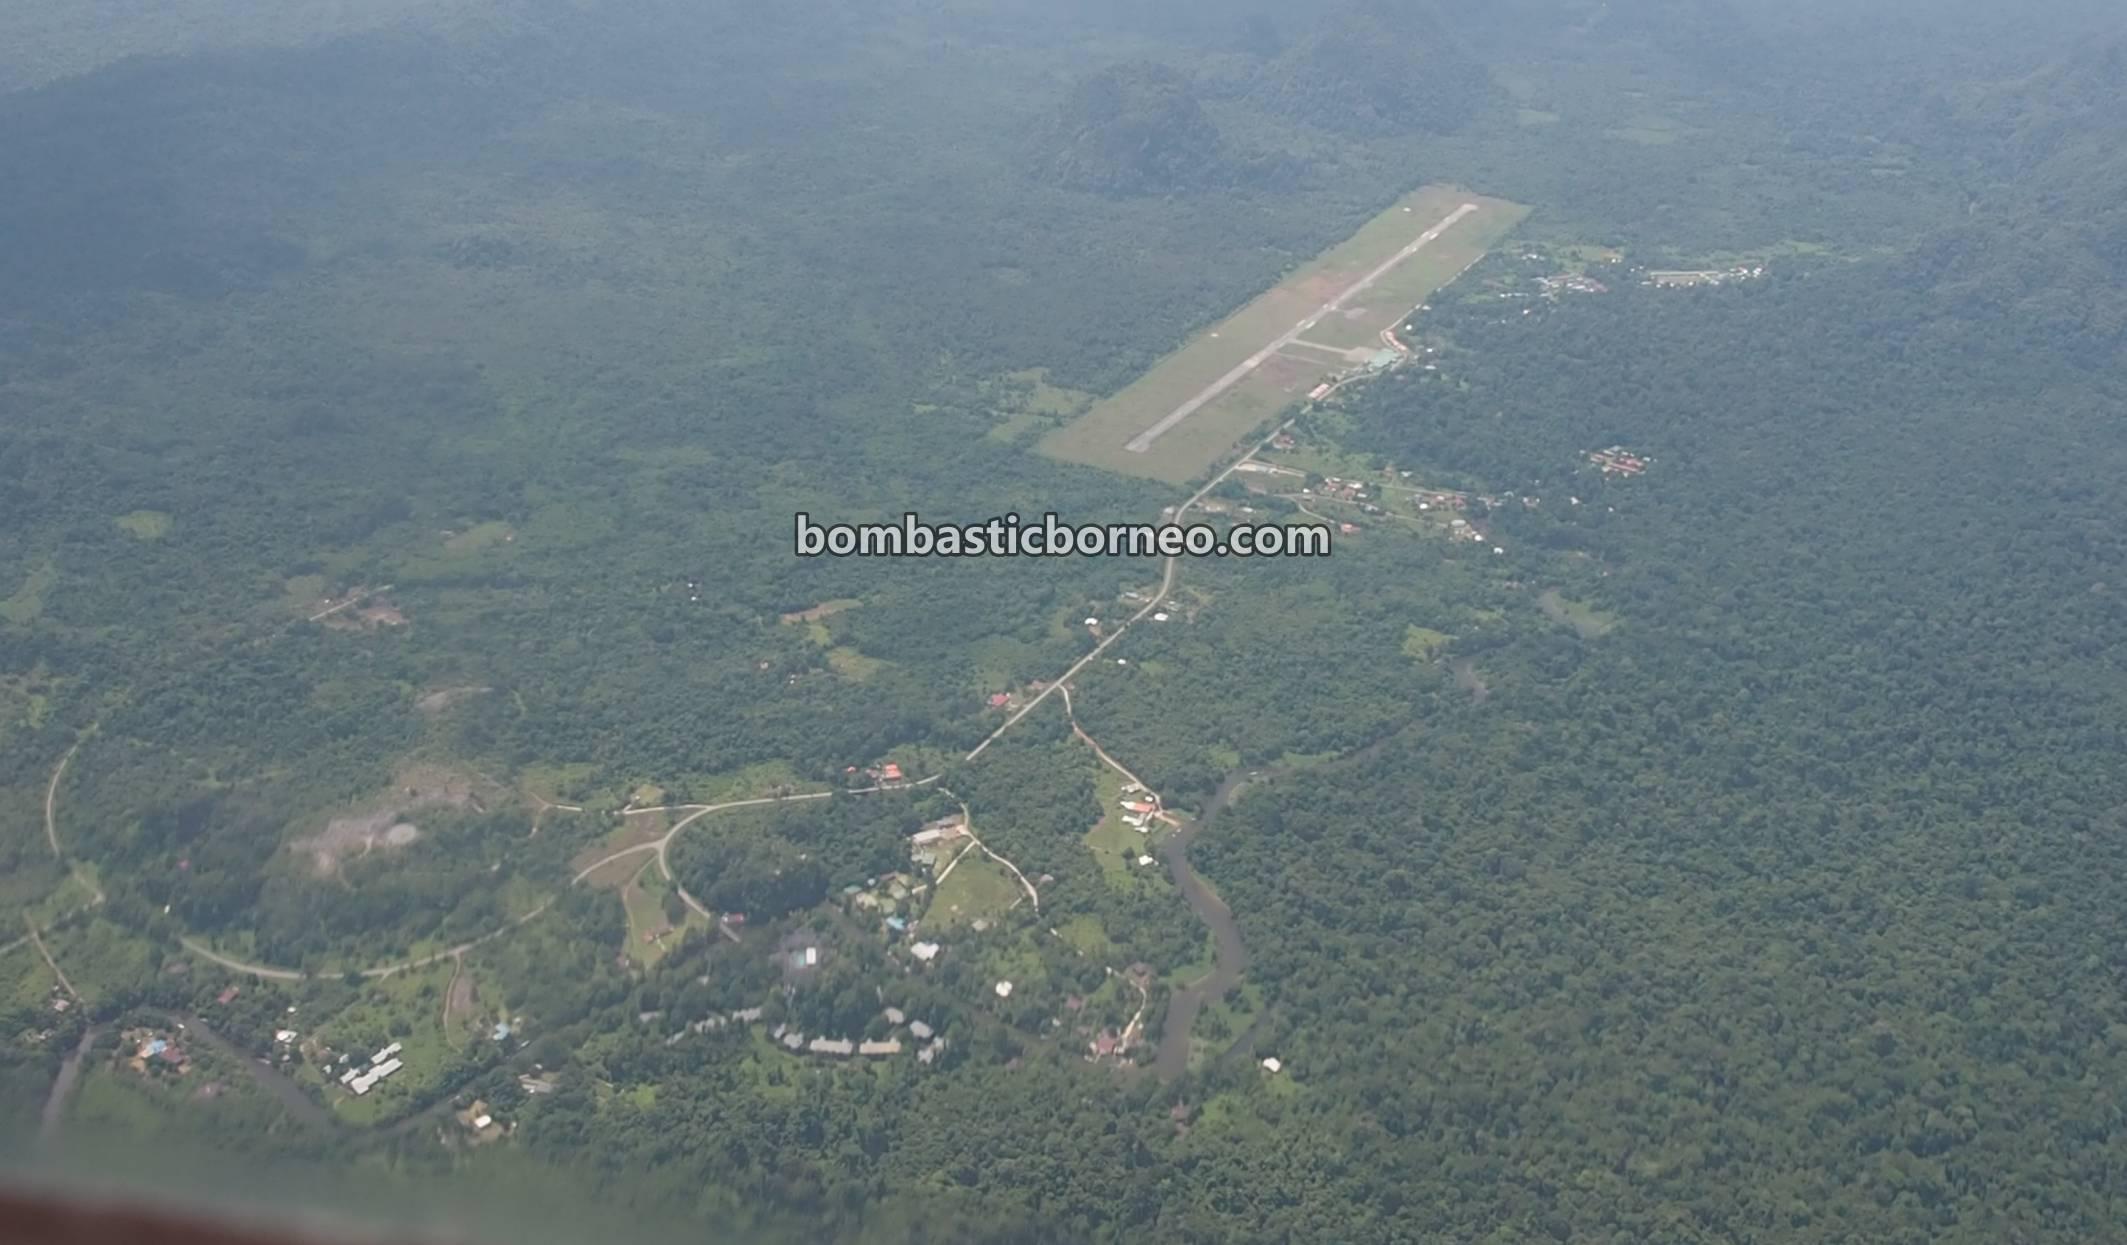 Mas wings flight, twin otter, adventure, Transportation, interior village, backpackers, exploration, Miri, Tourism, tourist attraction, cross border, 探索婆罗洲砂拉越, 马来西亚内陆机场